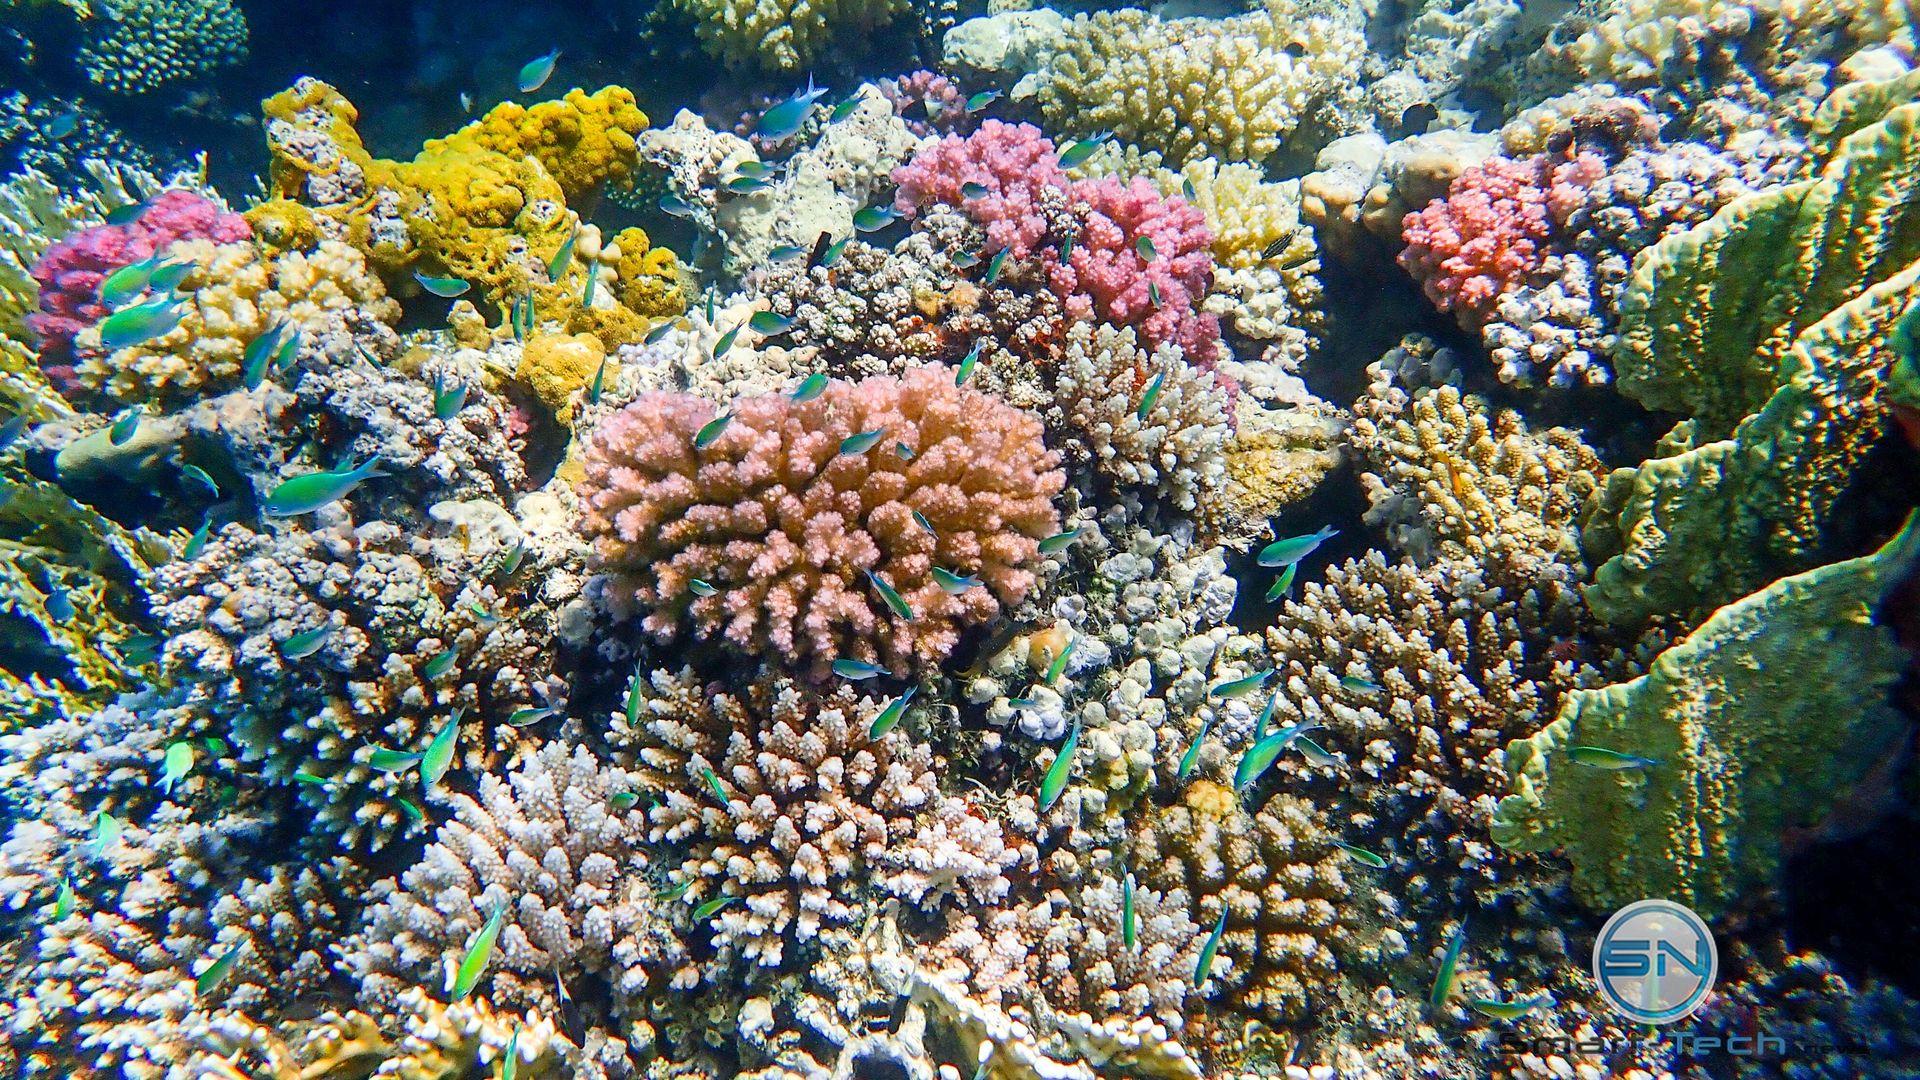 Korallengarten MarsaAlam Egypt - Olympu TG5